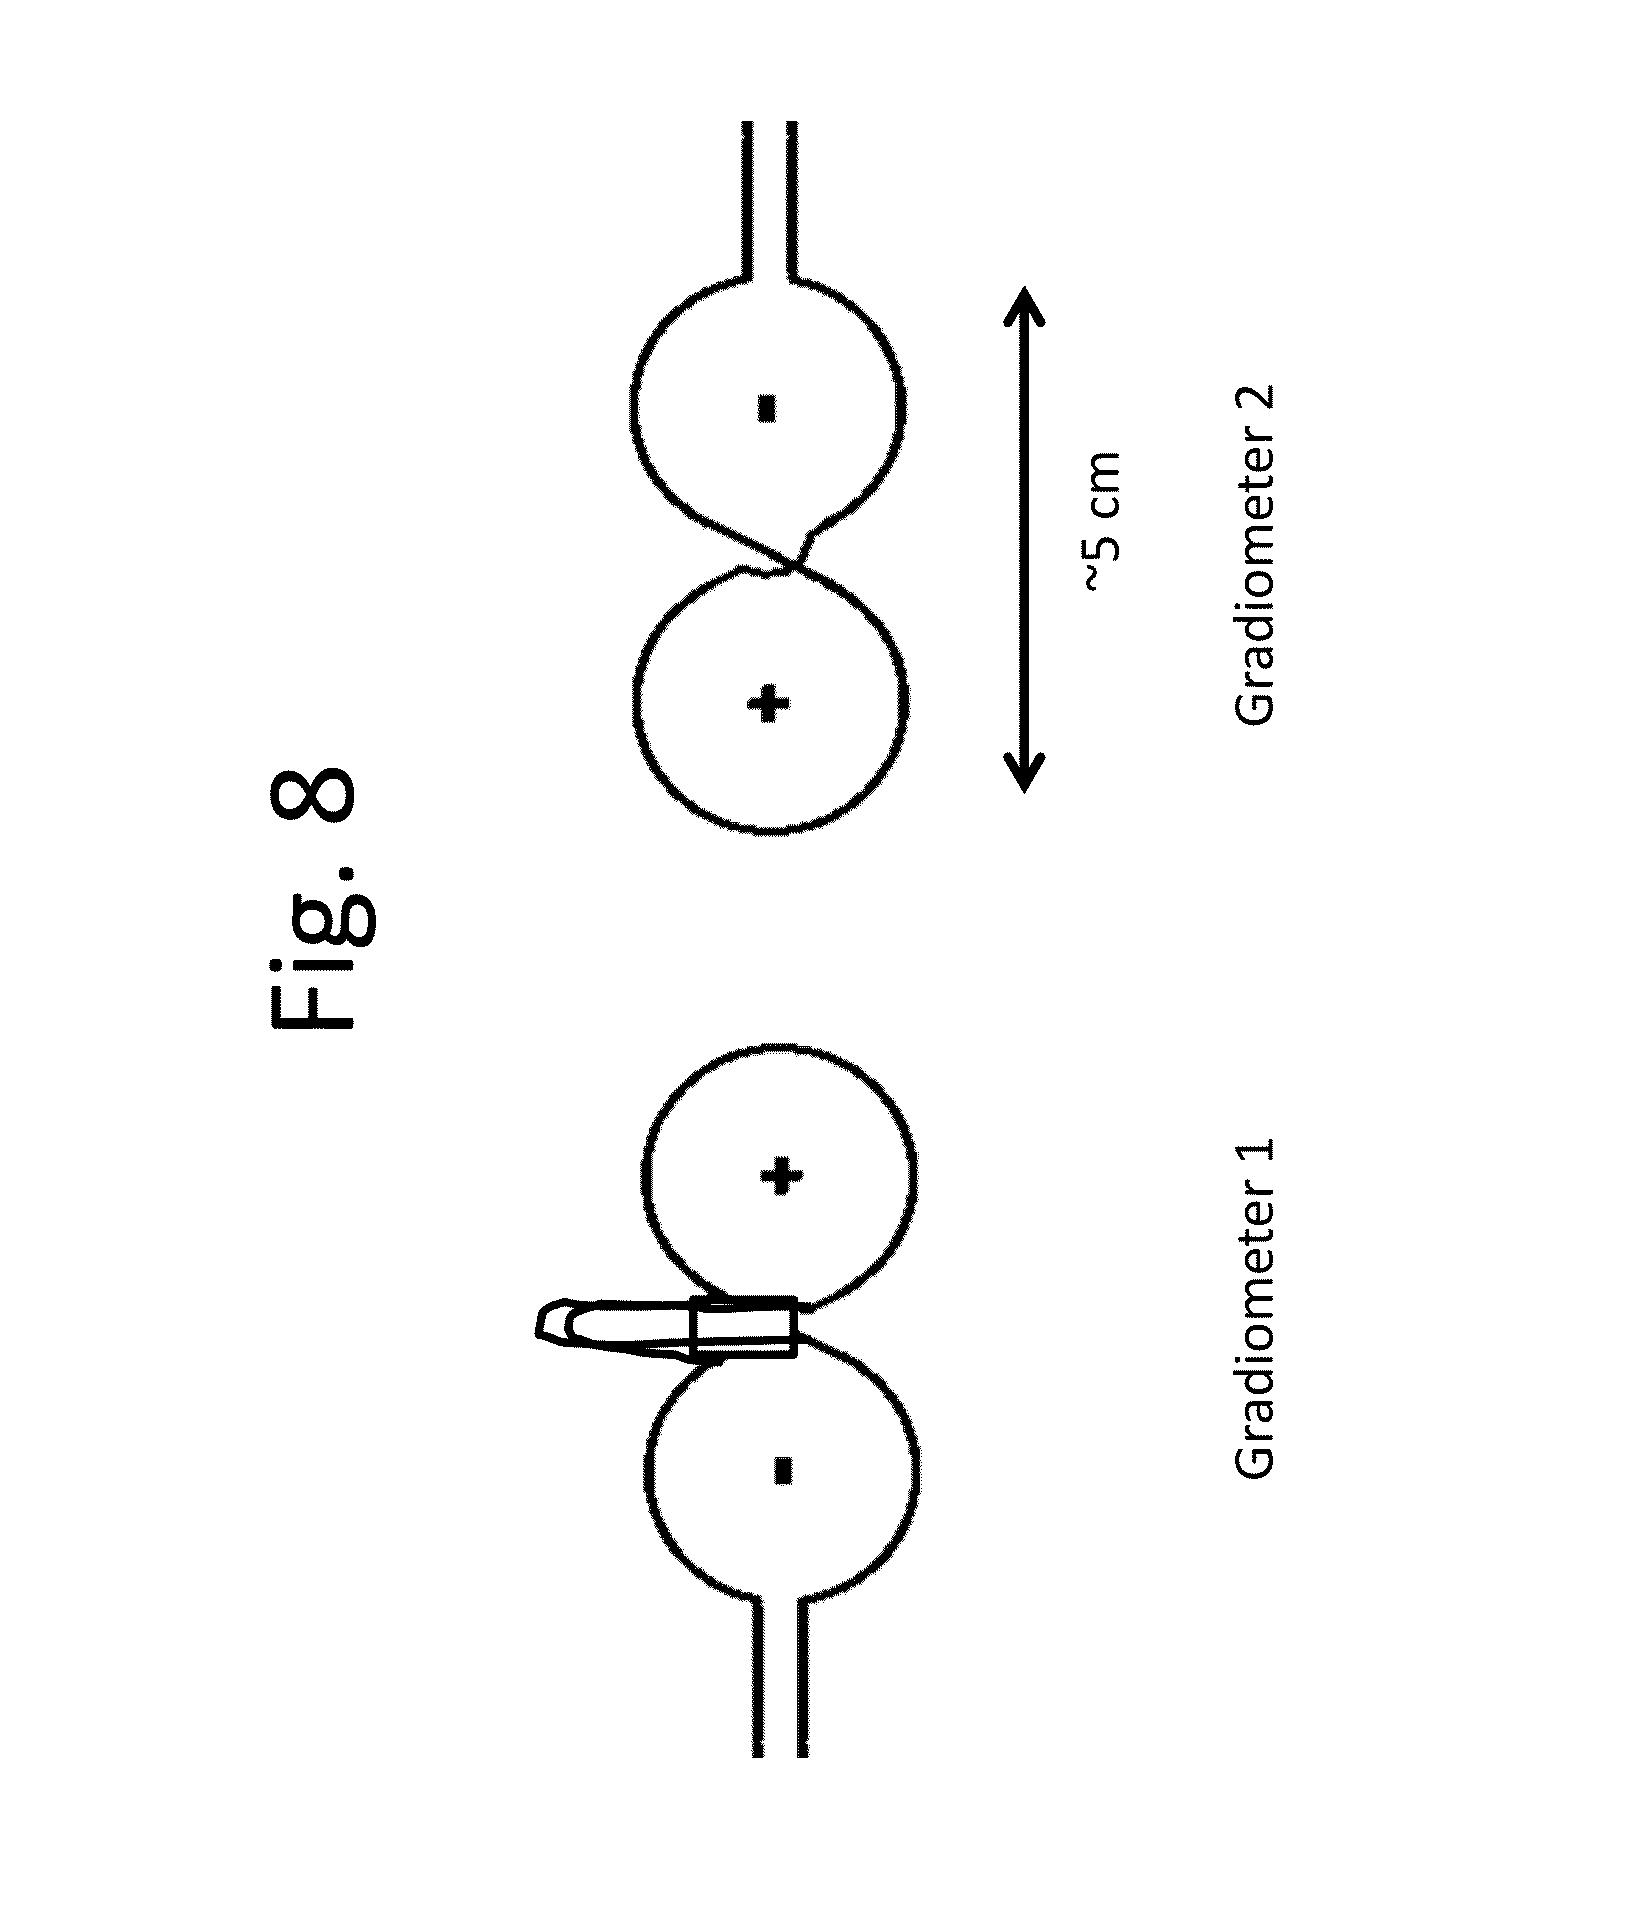 Patent US 9,404,954 B2